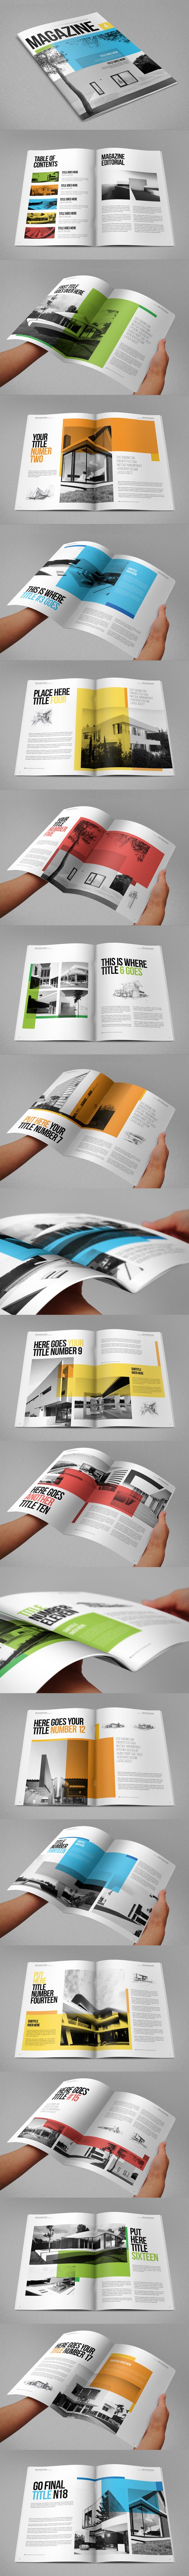 Modern Architecture Magazine. Download here: http://graphicriver.net/item/modern-architecture-magazine/8805408?ref=abradesign #design #magazine